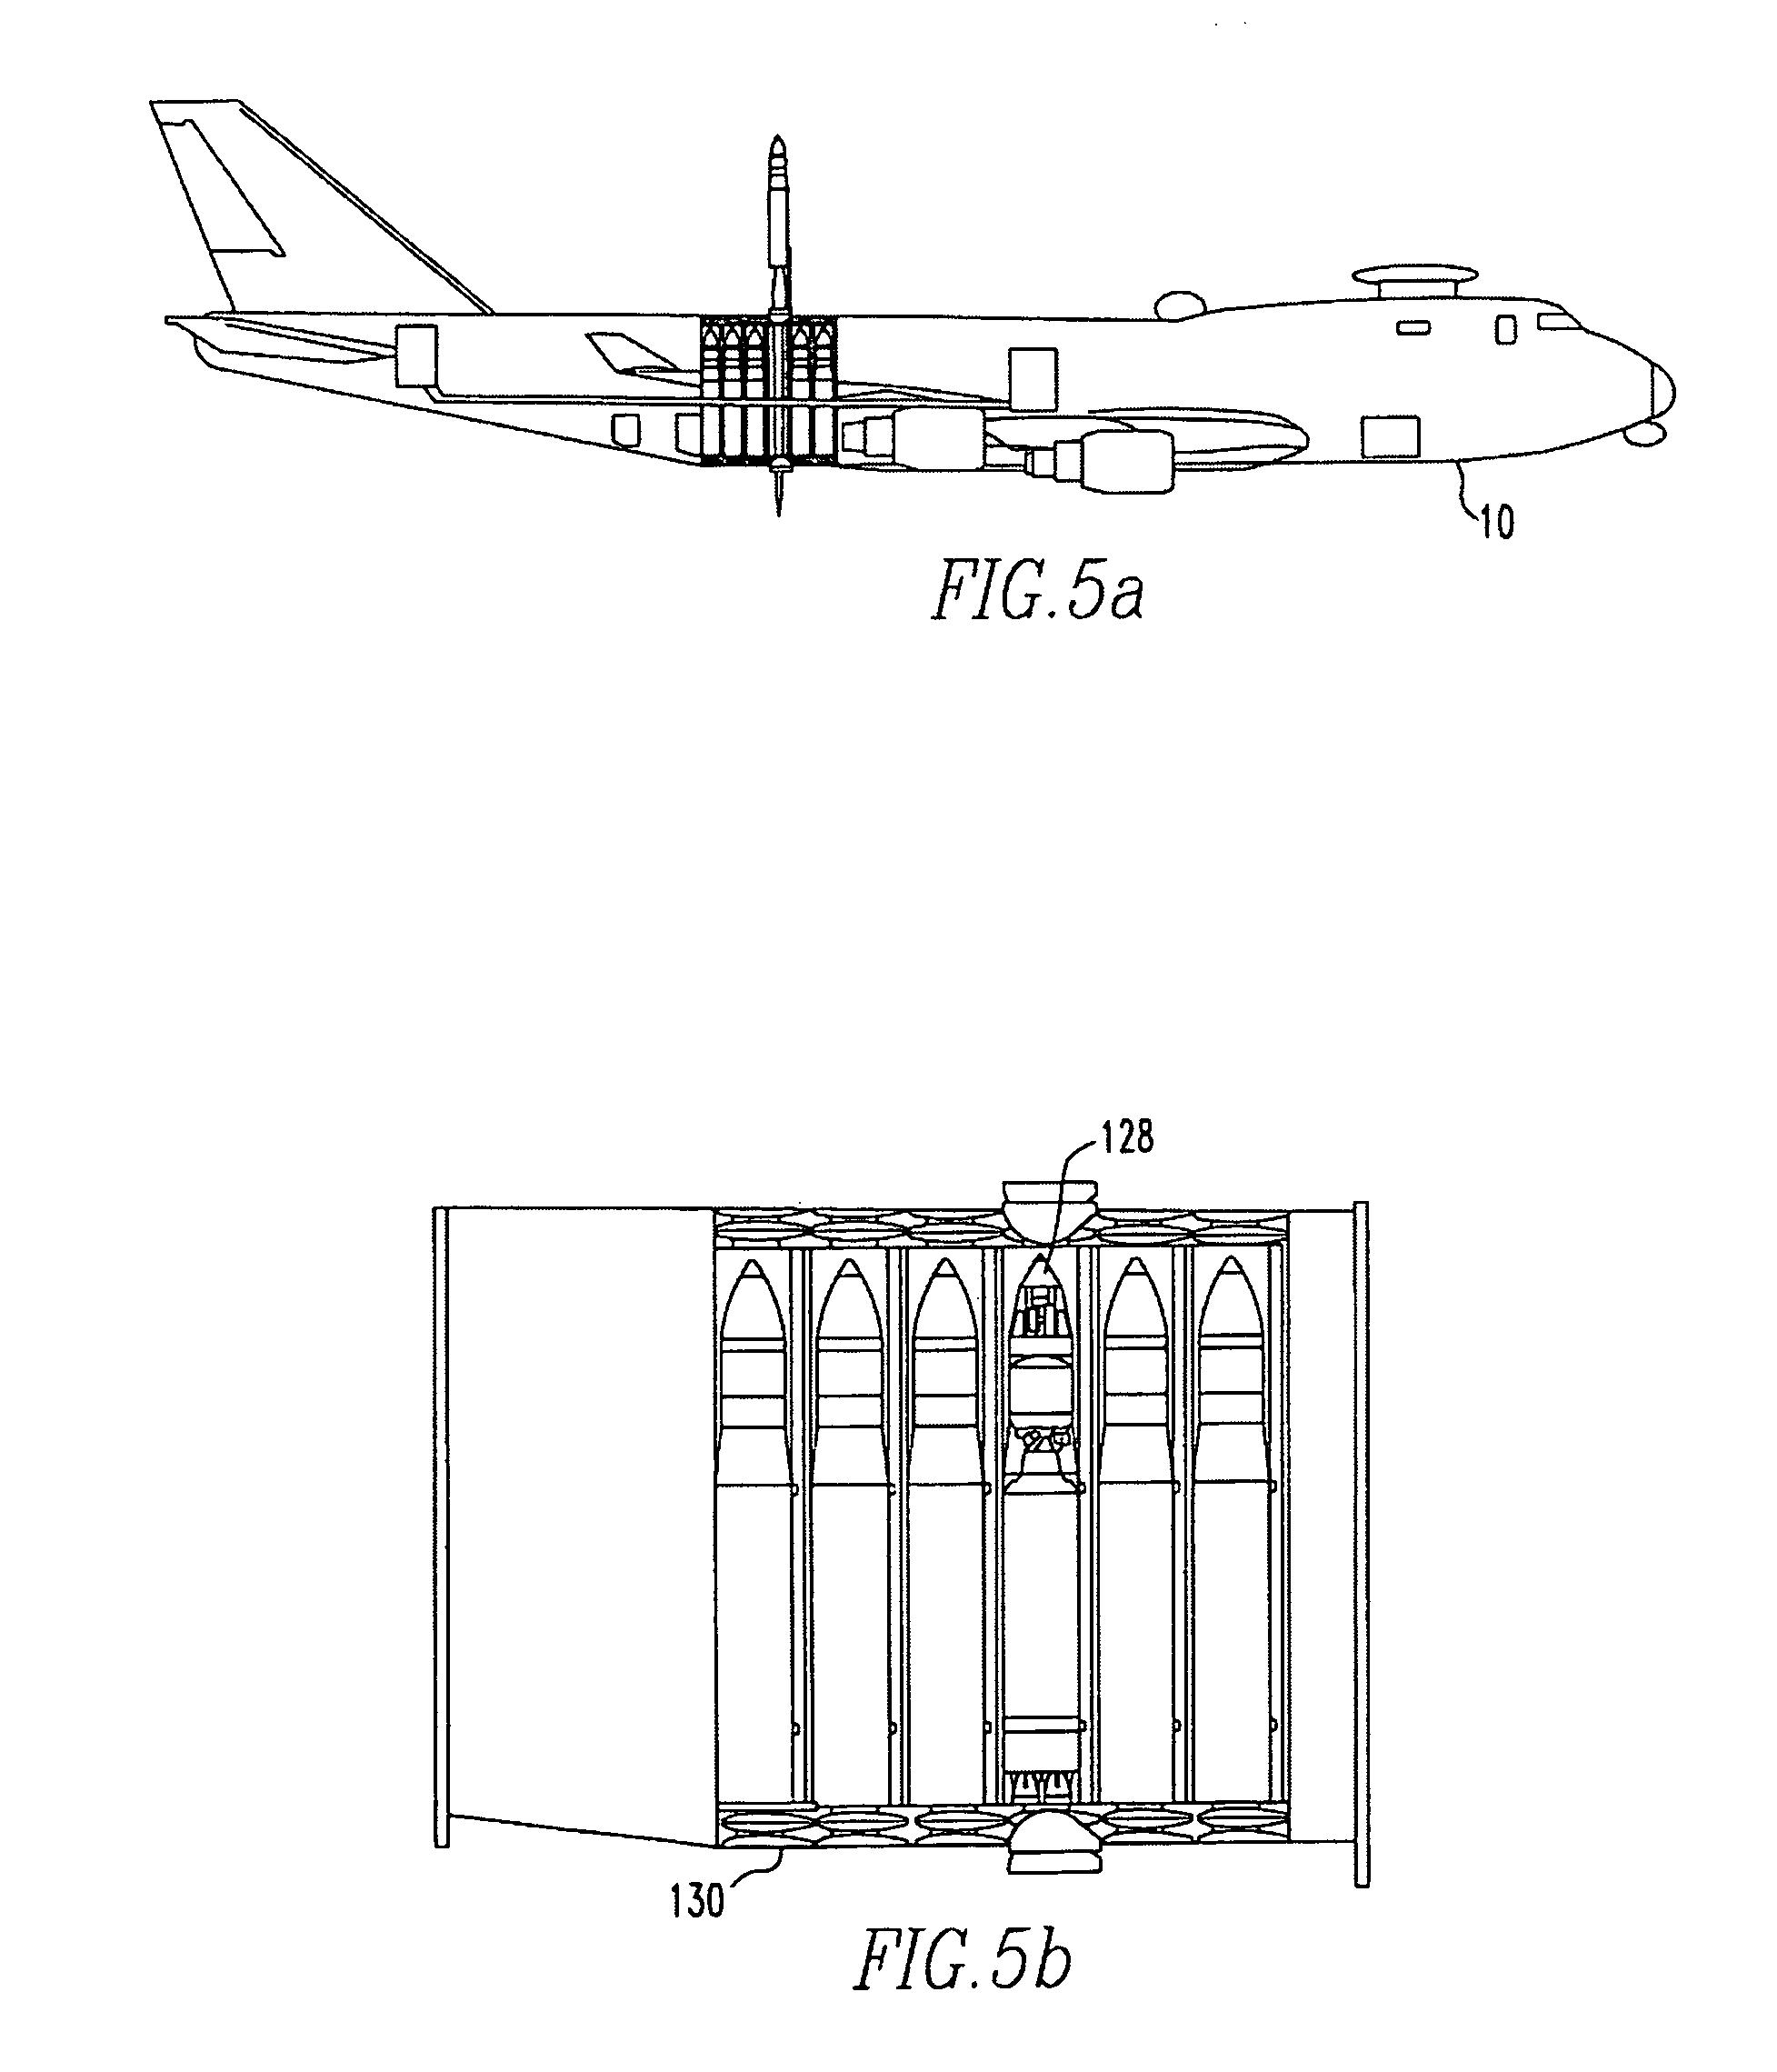 http://patentimages.storage.googleapis.com/US7849778B1/US07849778-20101214-D00006.png